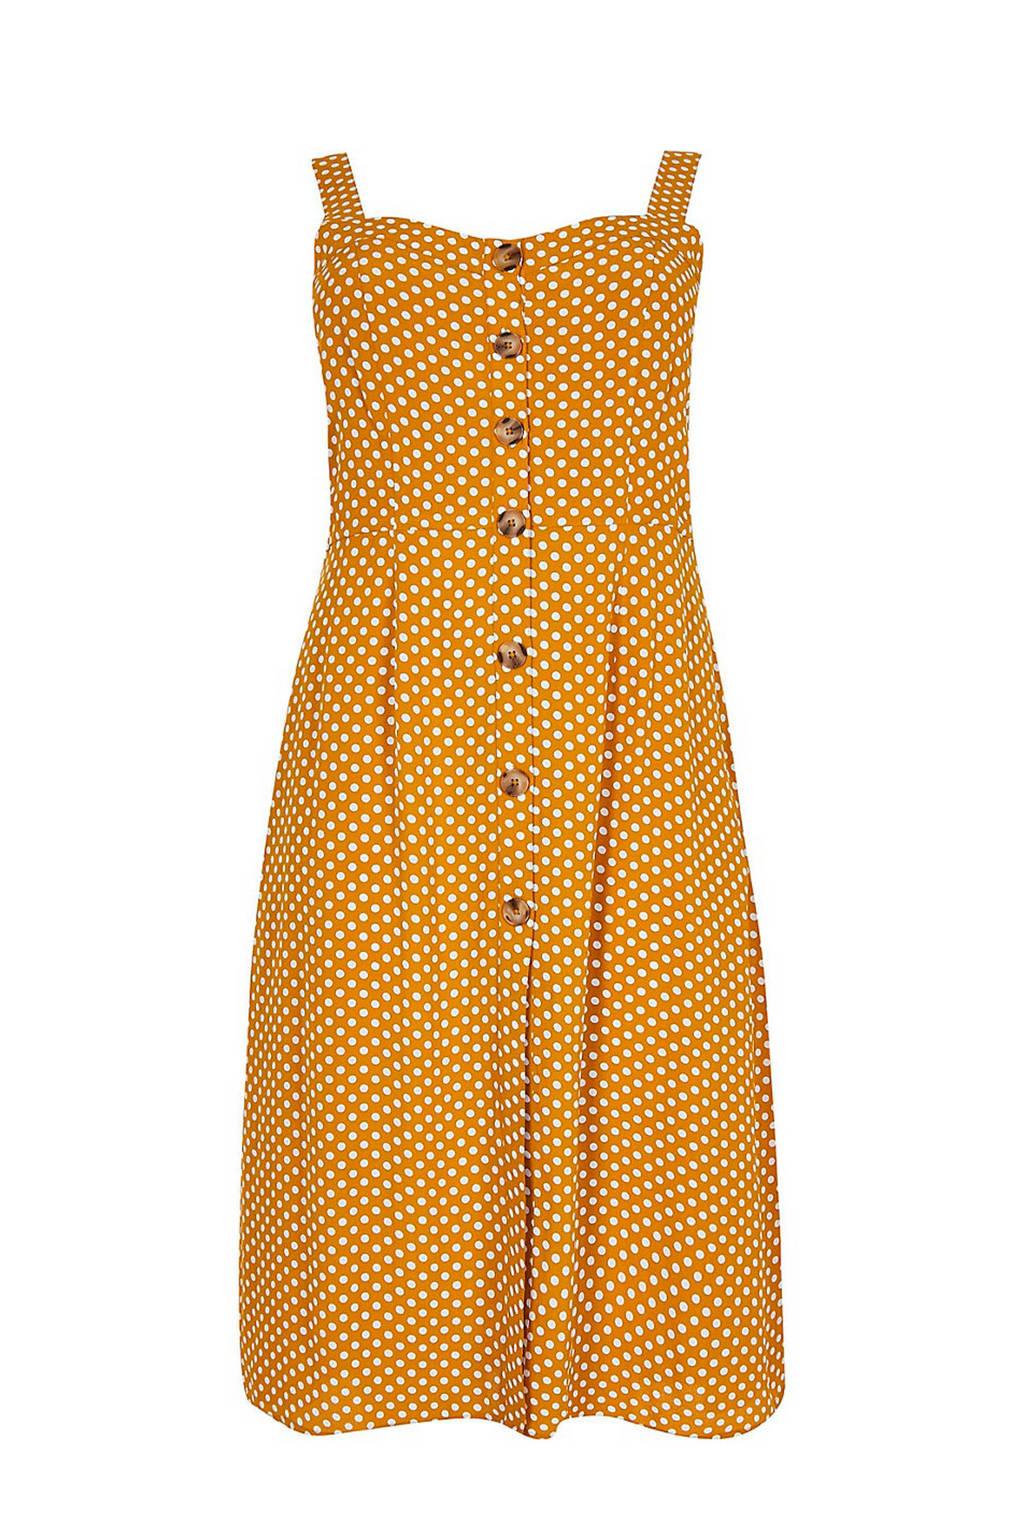 River Island Plus jurk met stippen, geel/ecru